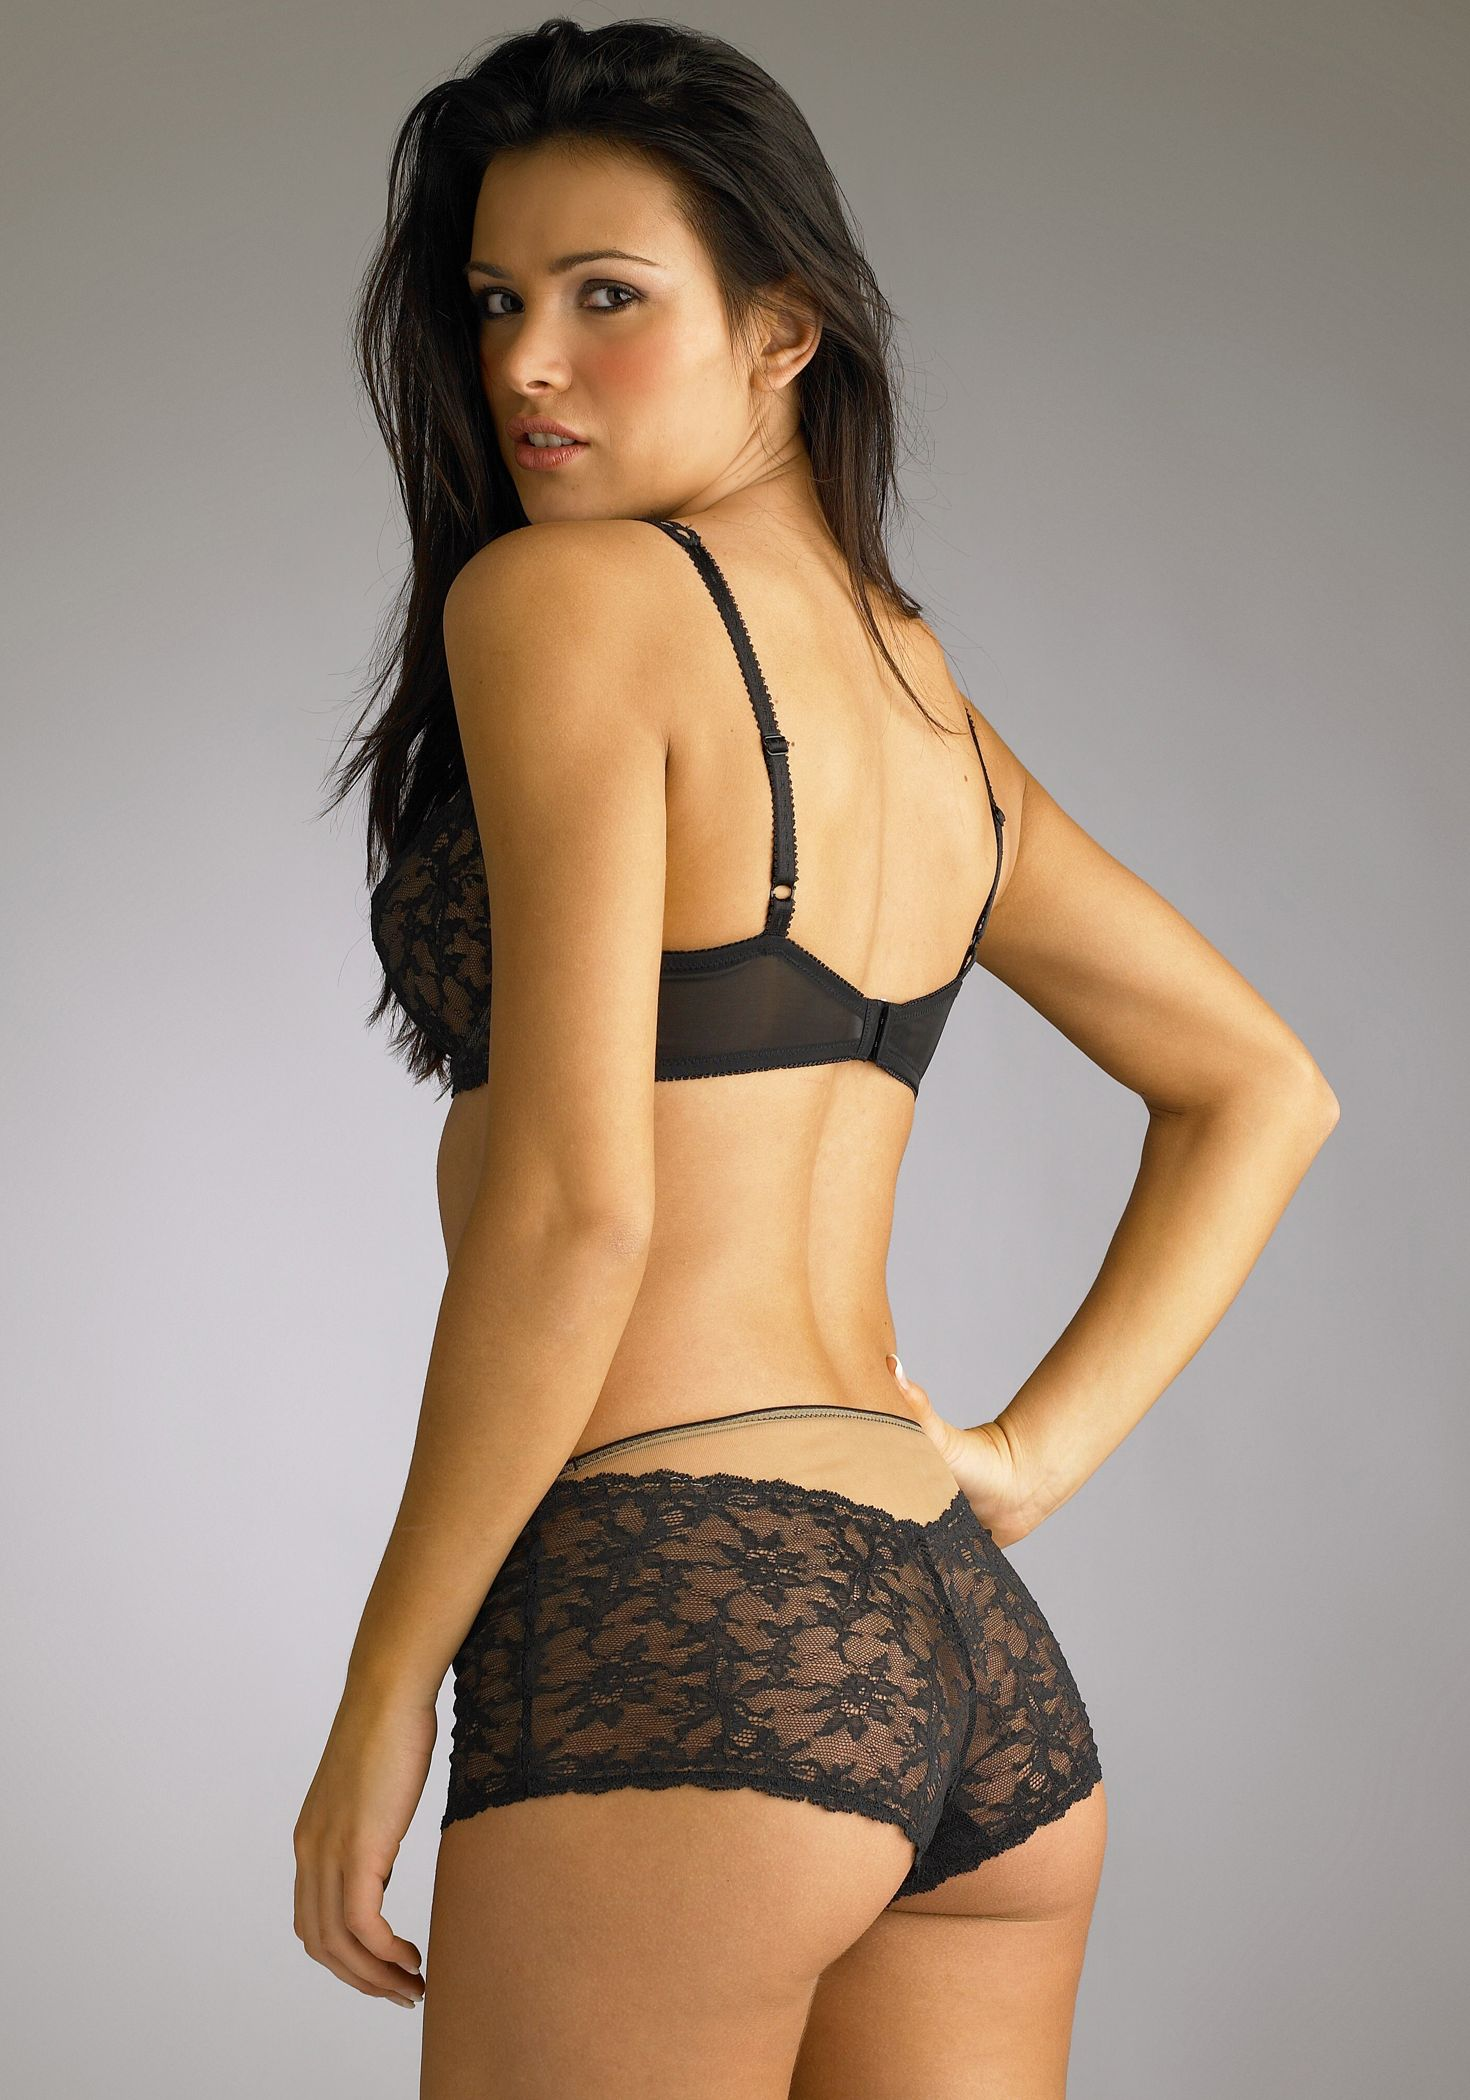 Opinion Alina vacariu lingerie share your